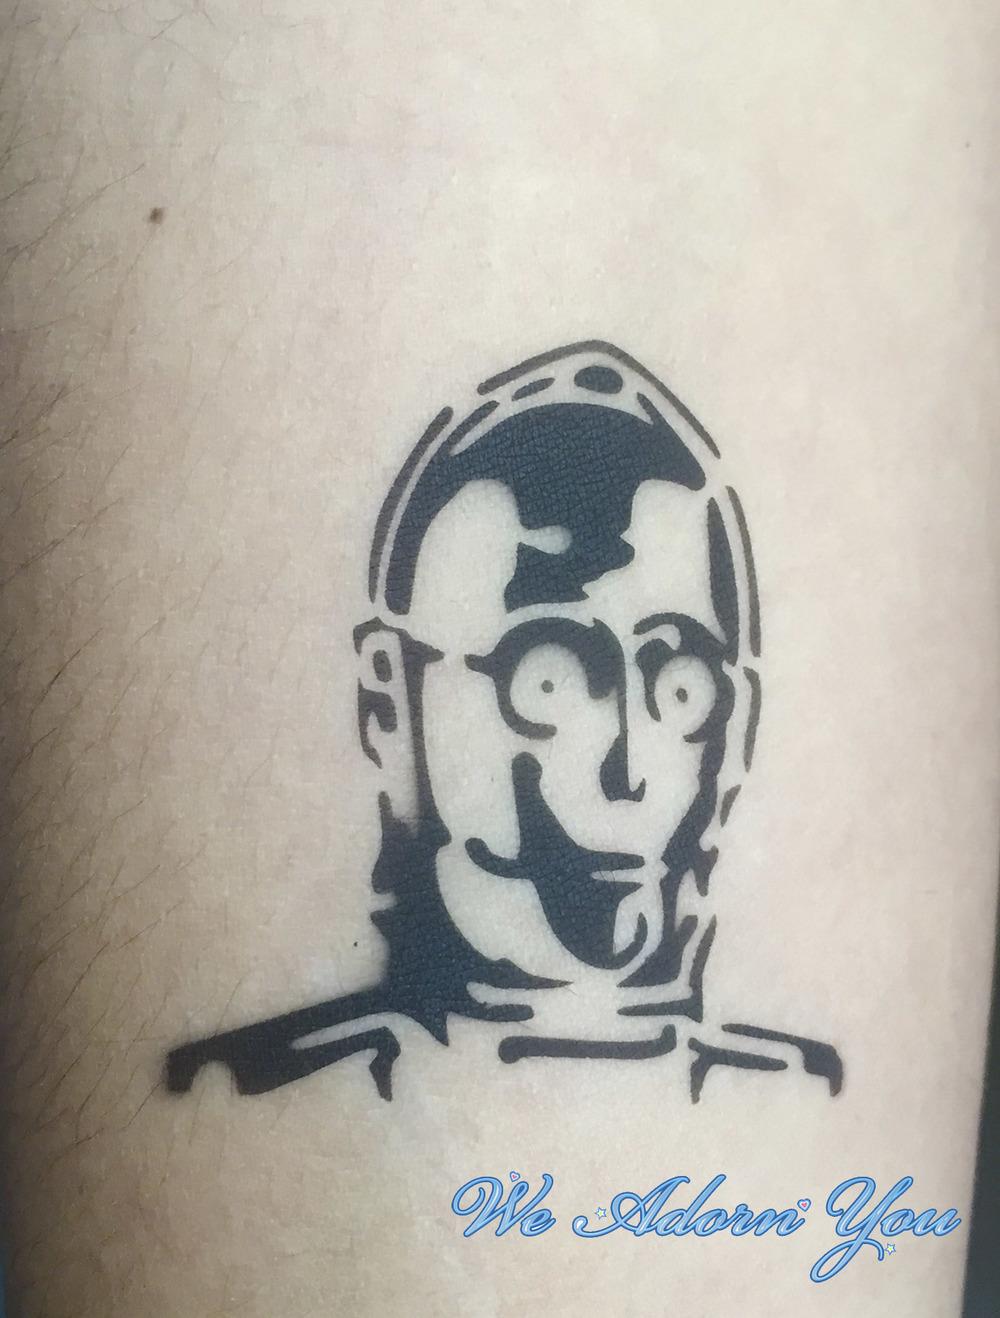 Airbrush Tattoo C3PO- We Adorn You.jpg